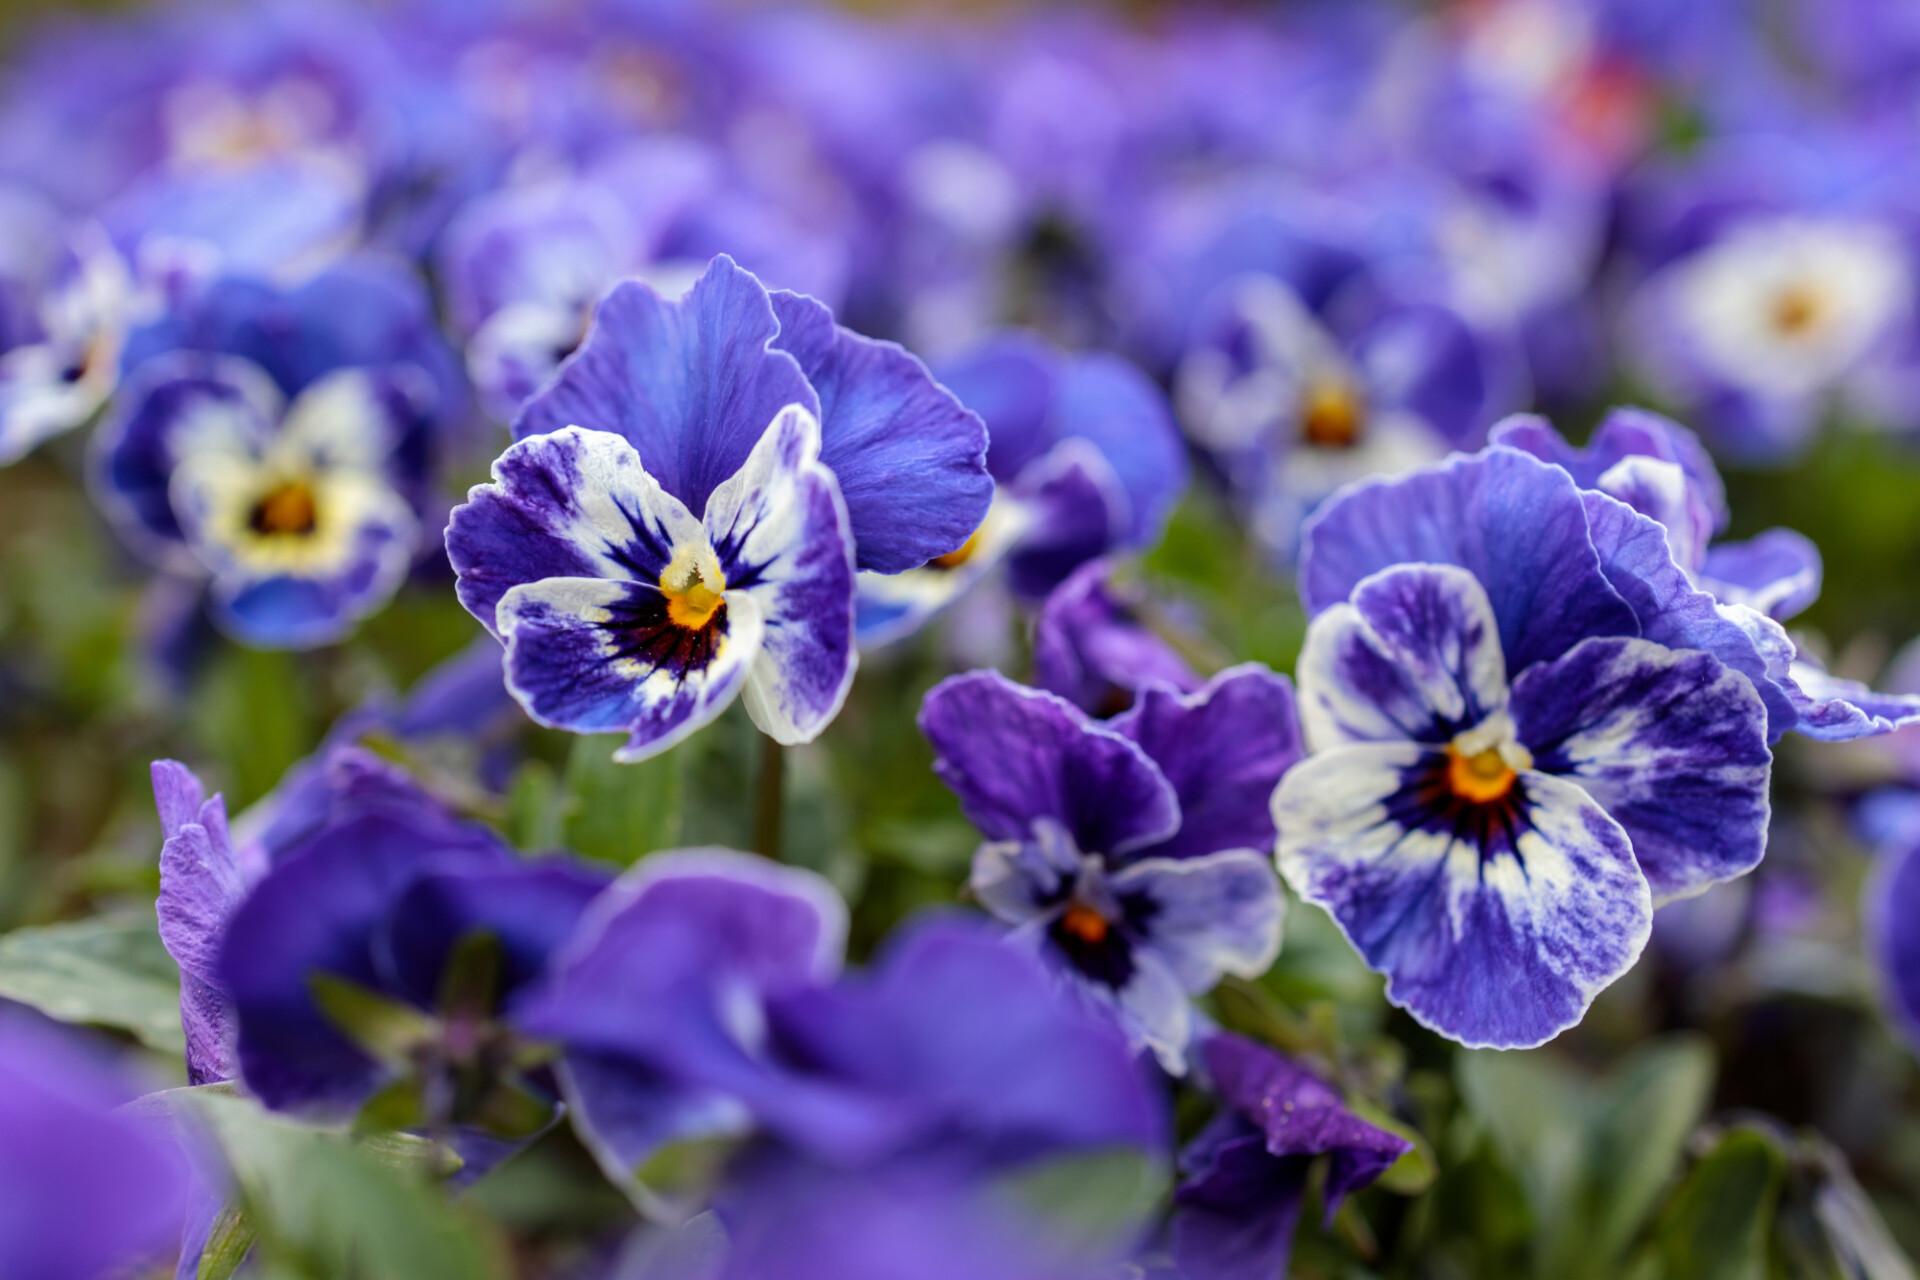 white and dark purple viola flowers